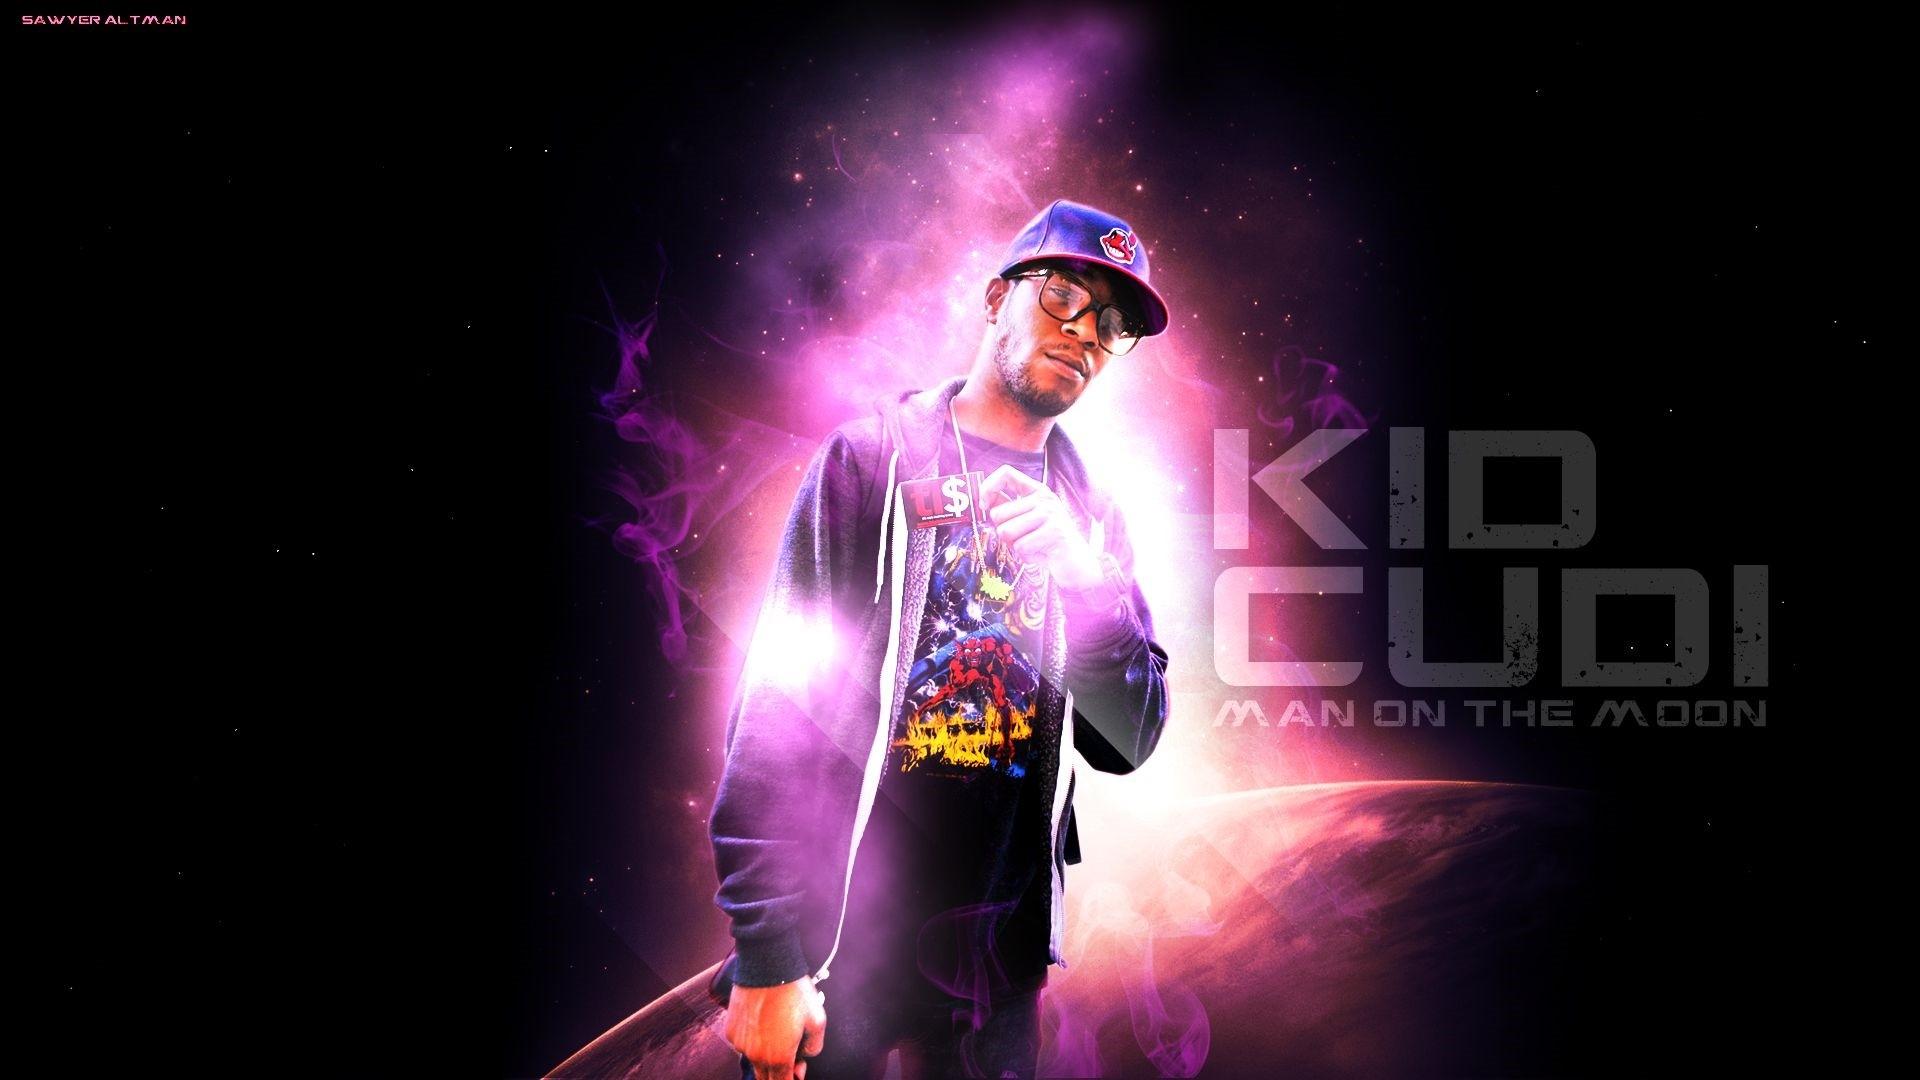 Kid Cudi hd desktop wallpaper